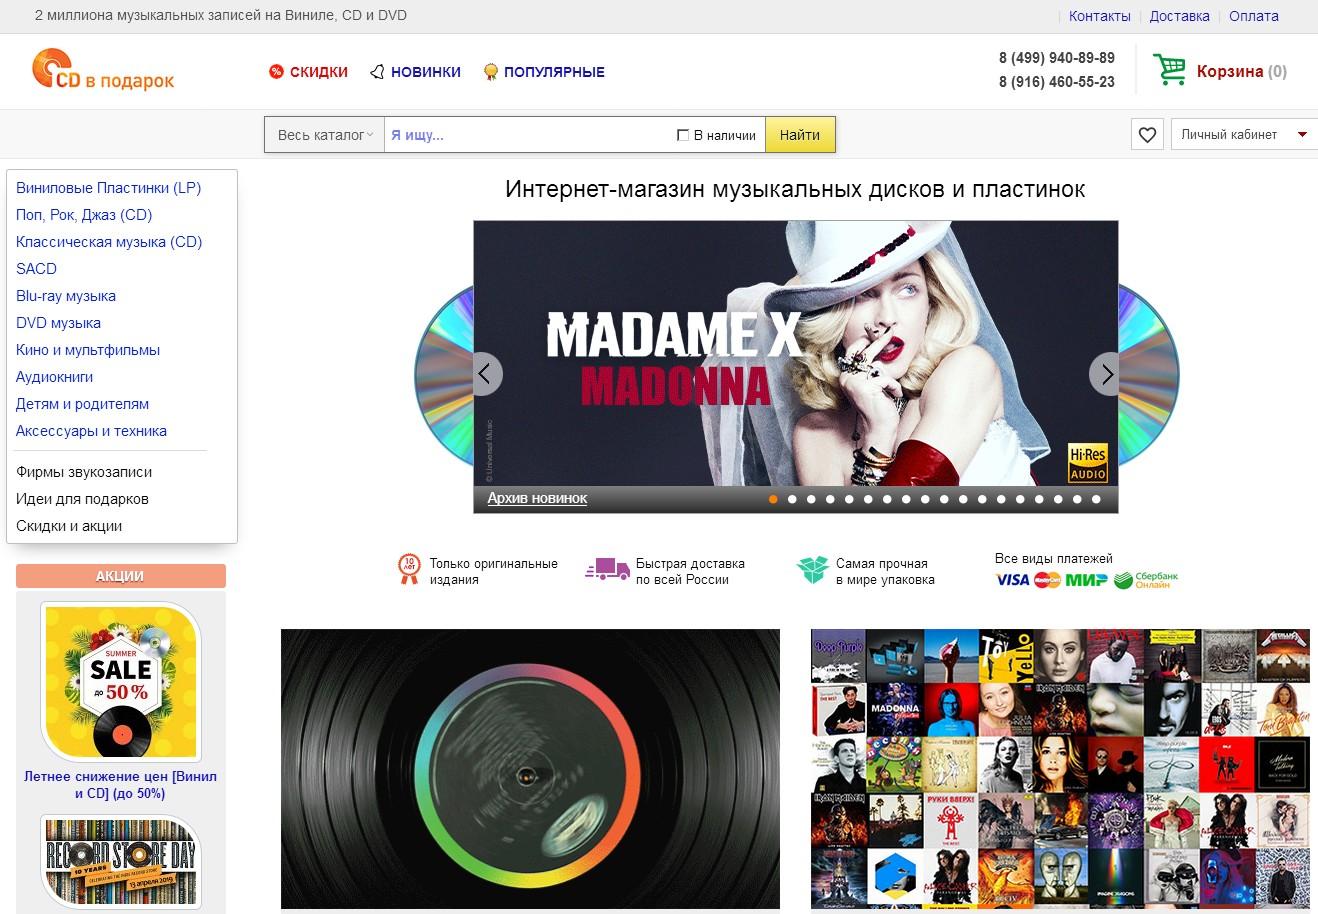 отзывы о cdvpodarok.ru